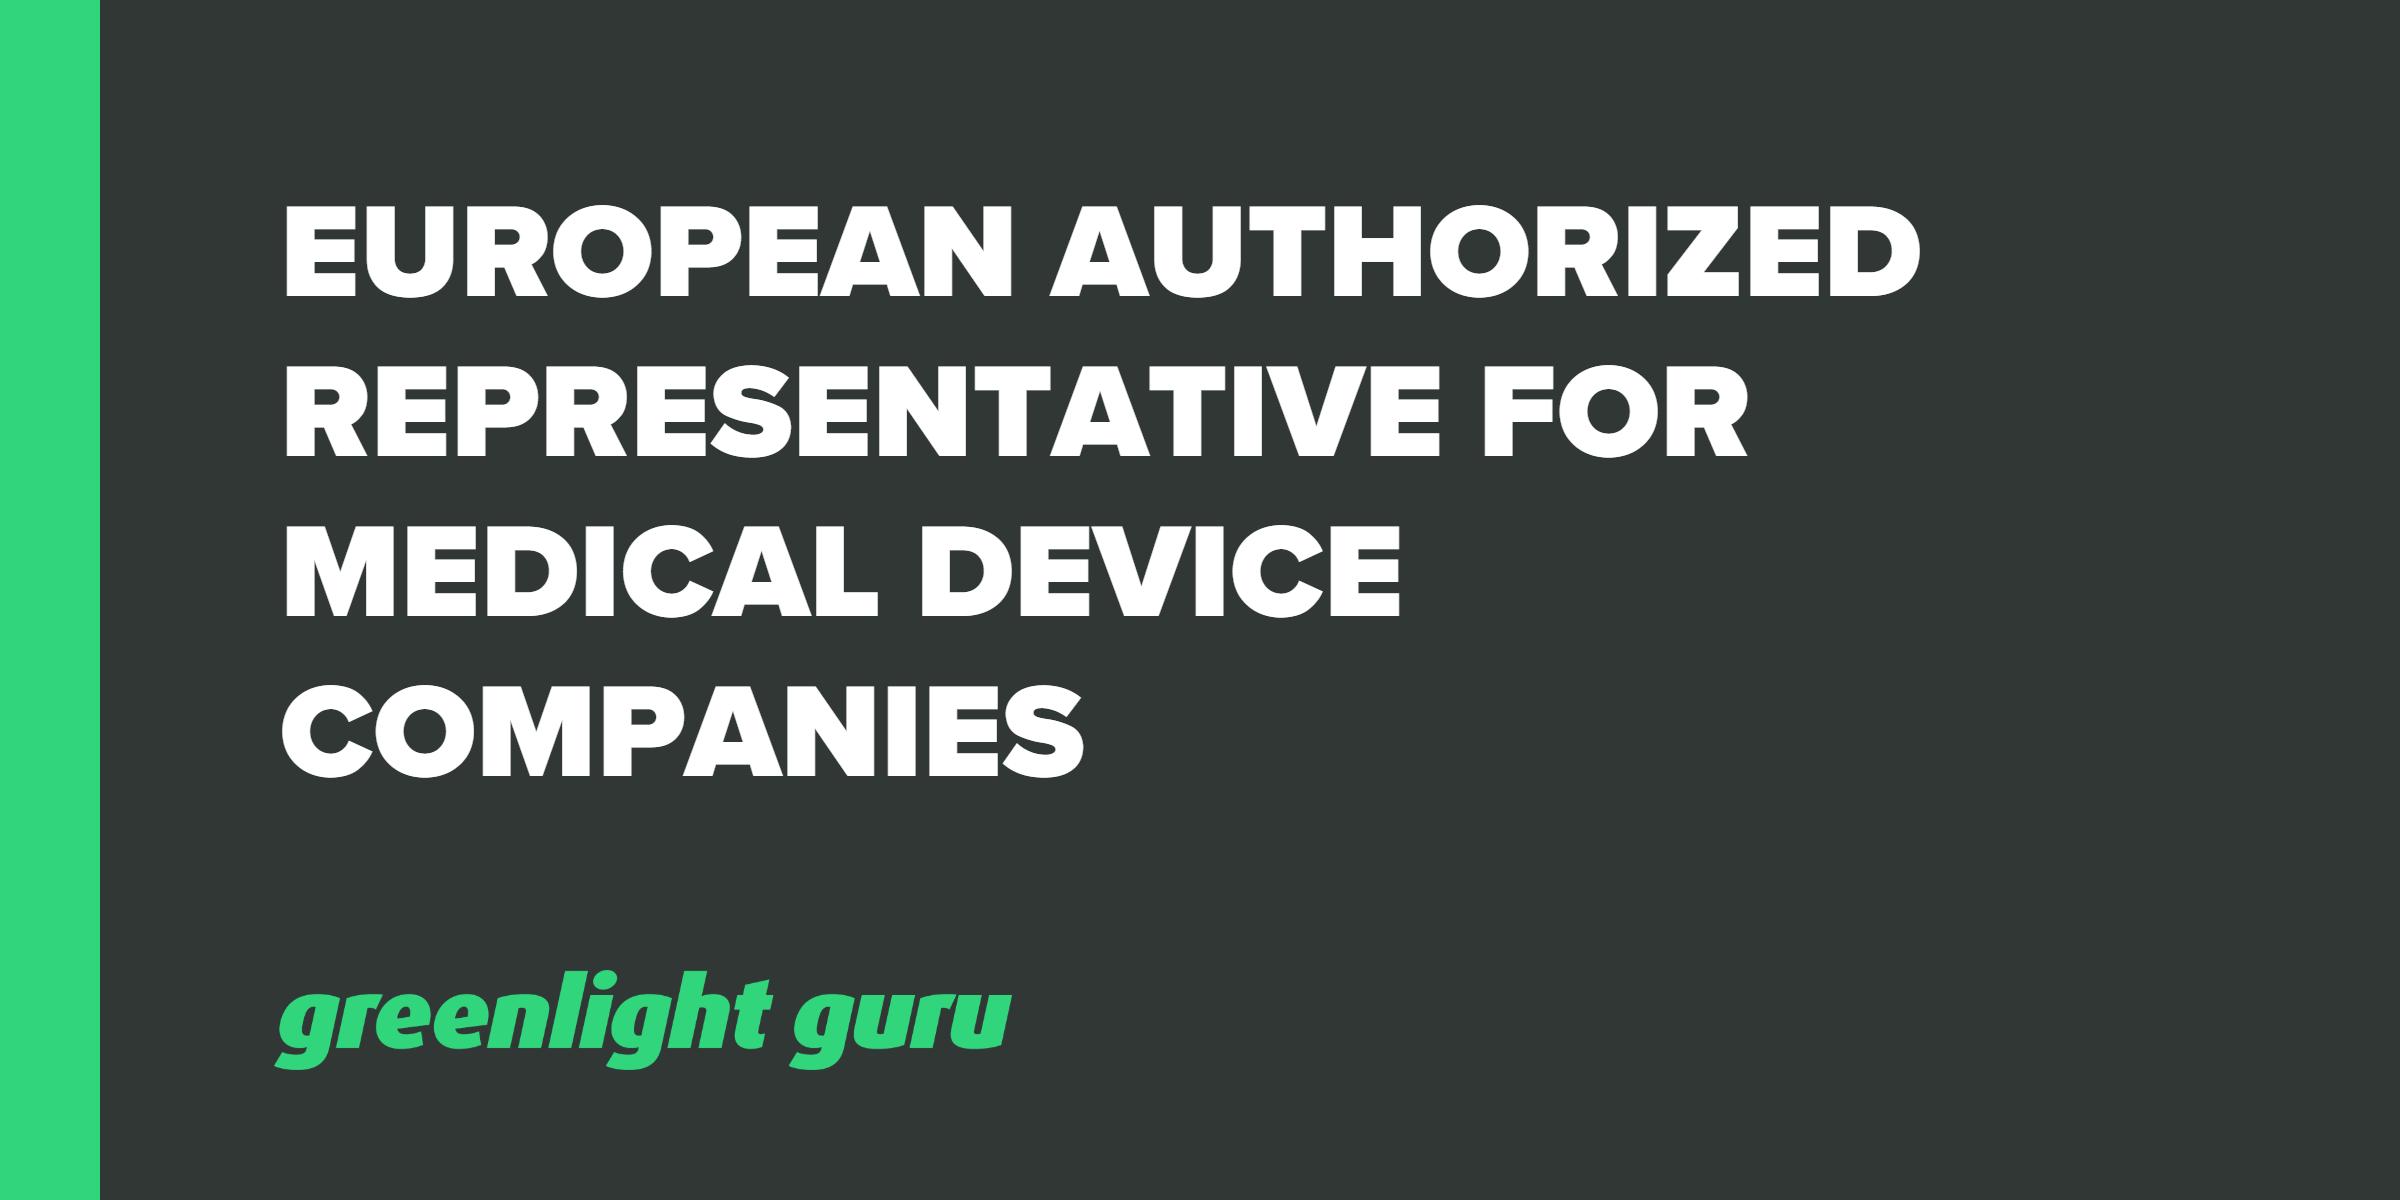 European Authorized Representative For Medical Device Companies